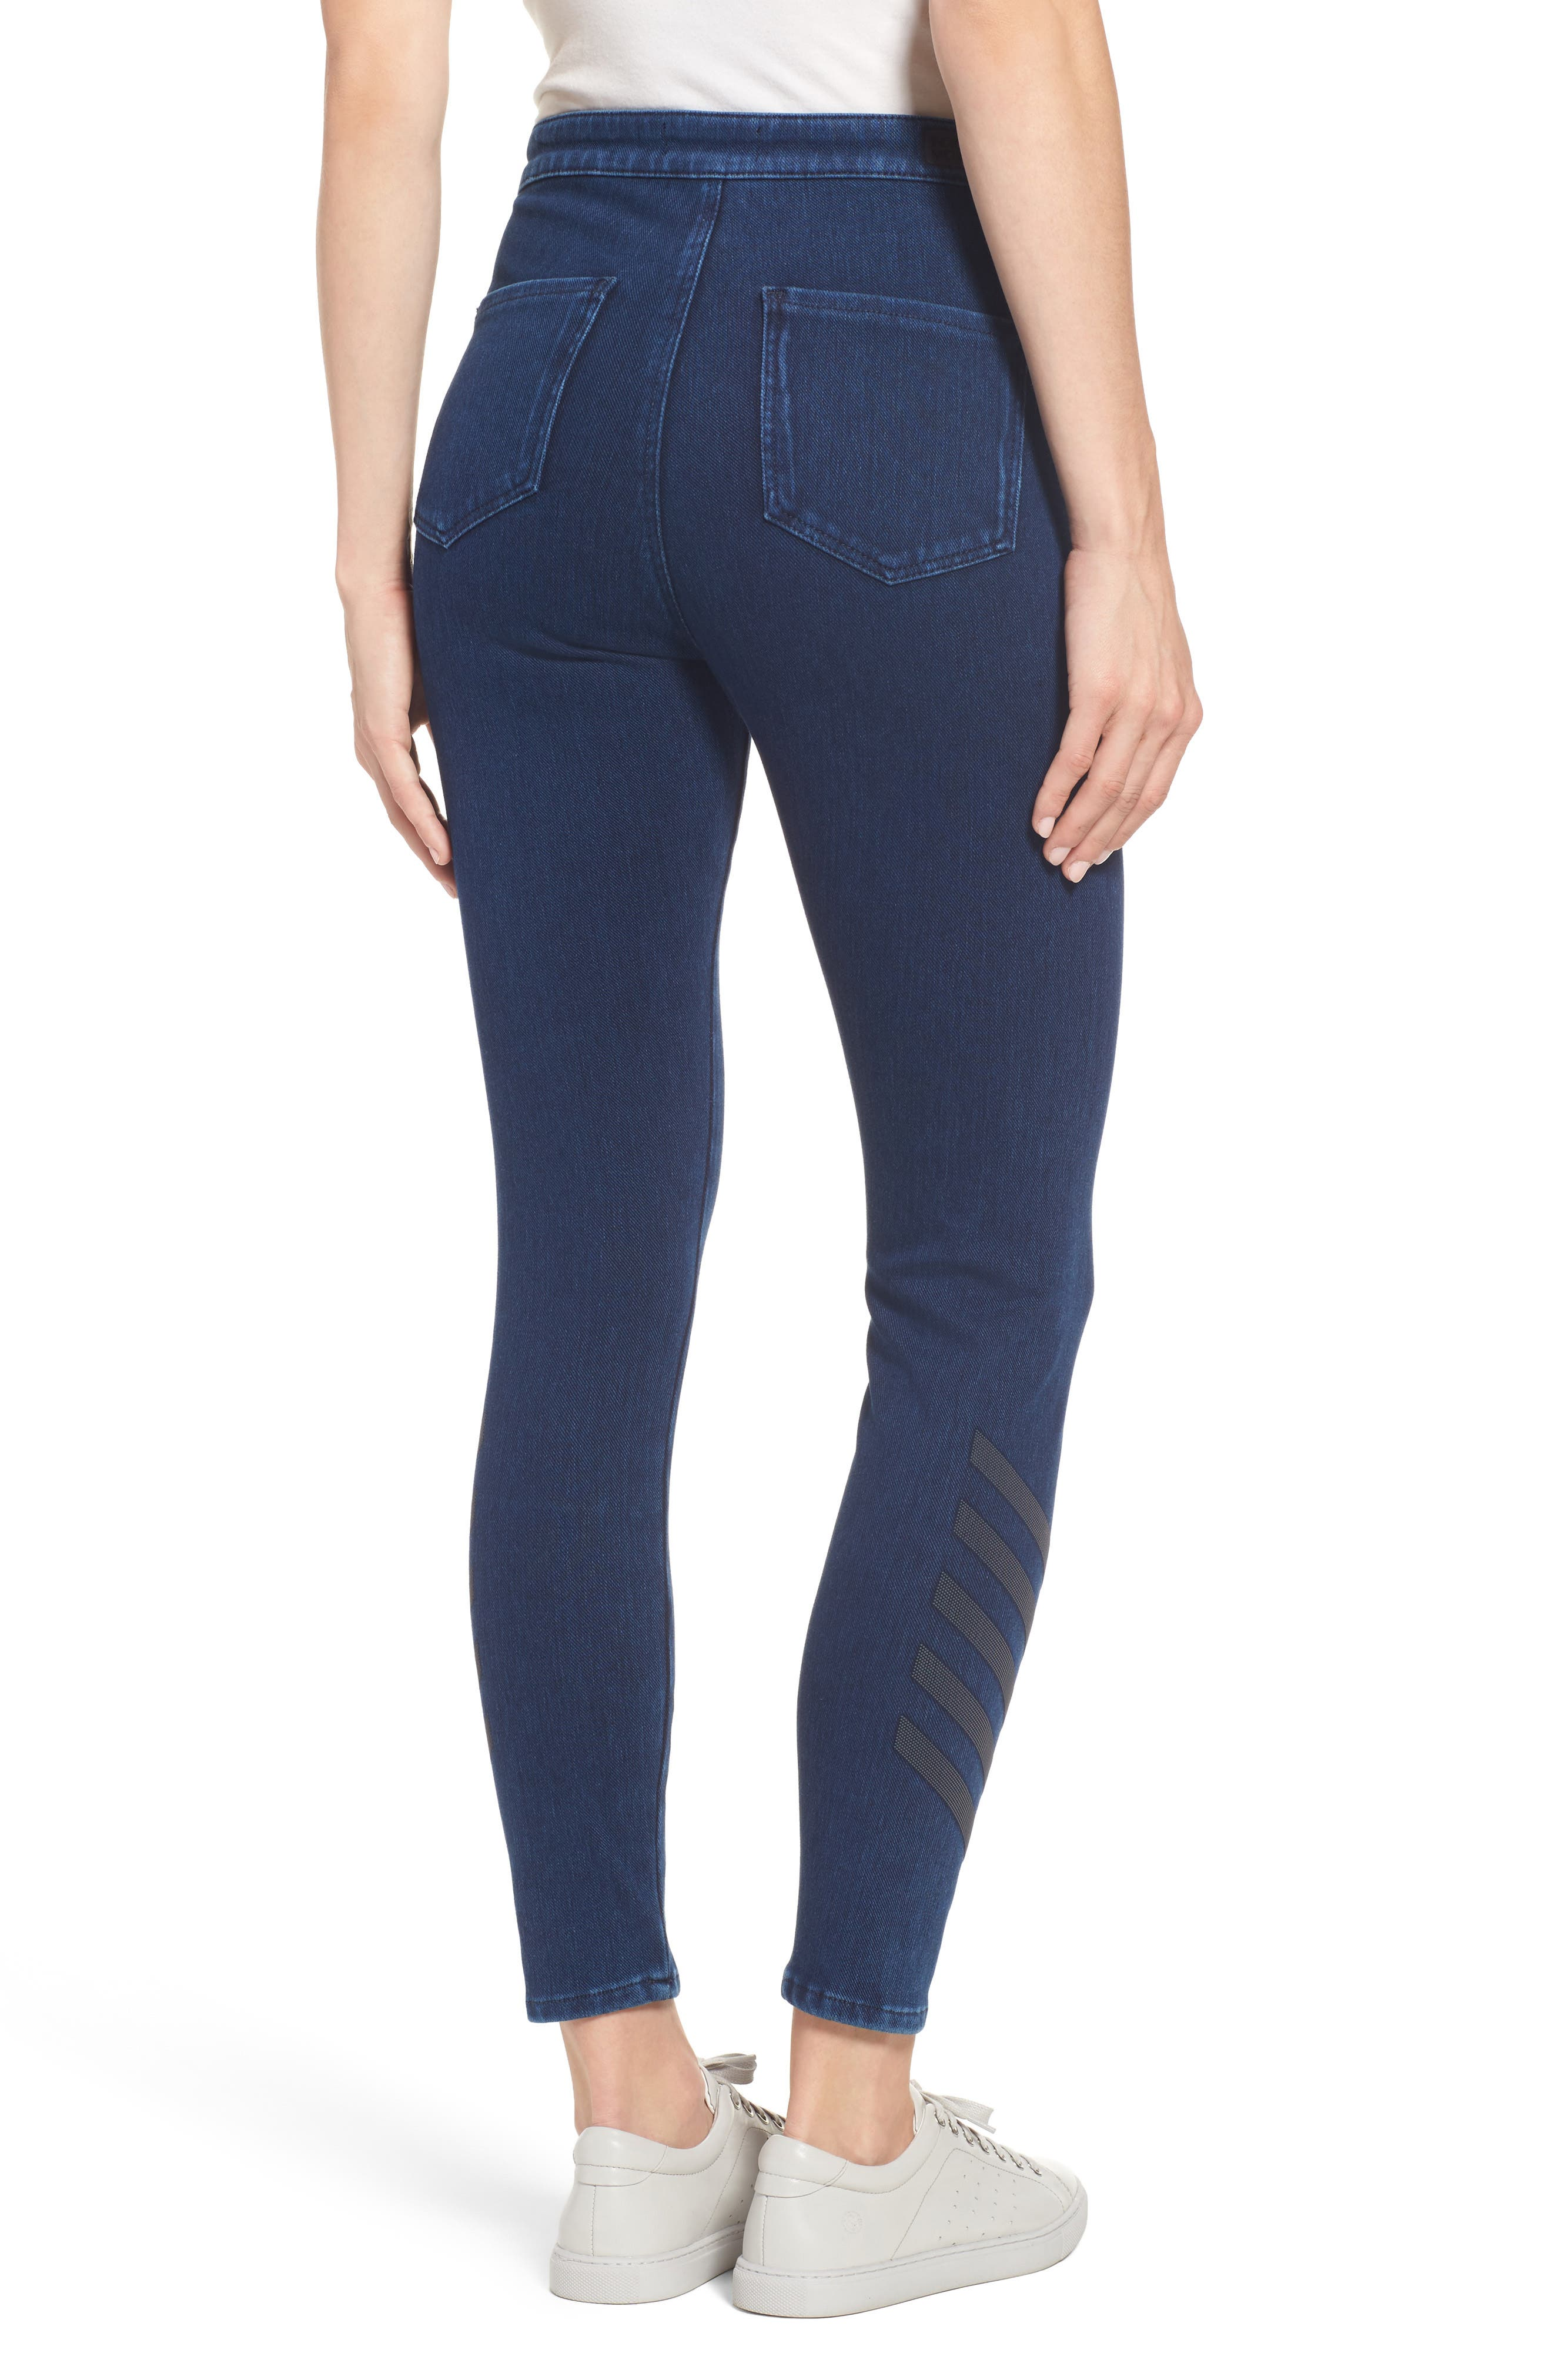 Joie Embellished High Waist Skinny Jeans,                             Alternate thumbnail 2, color,                             401